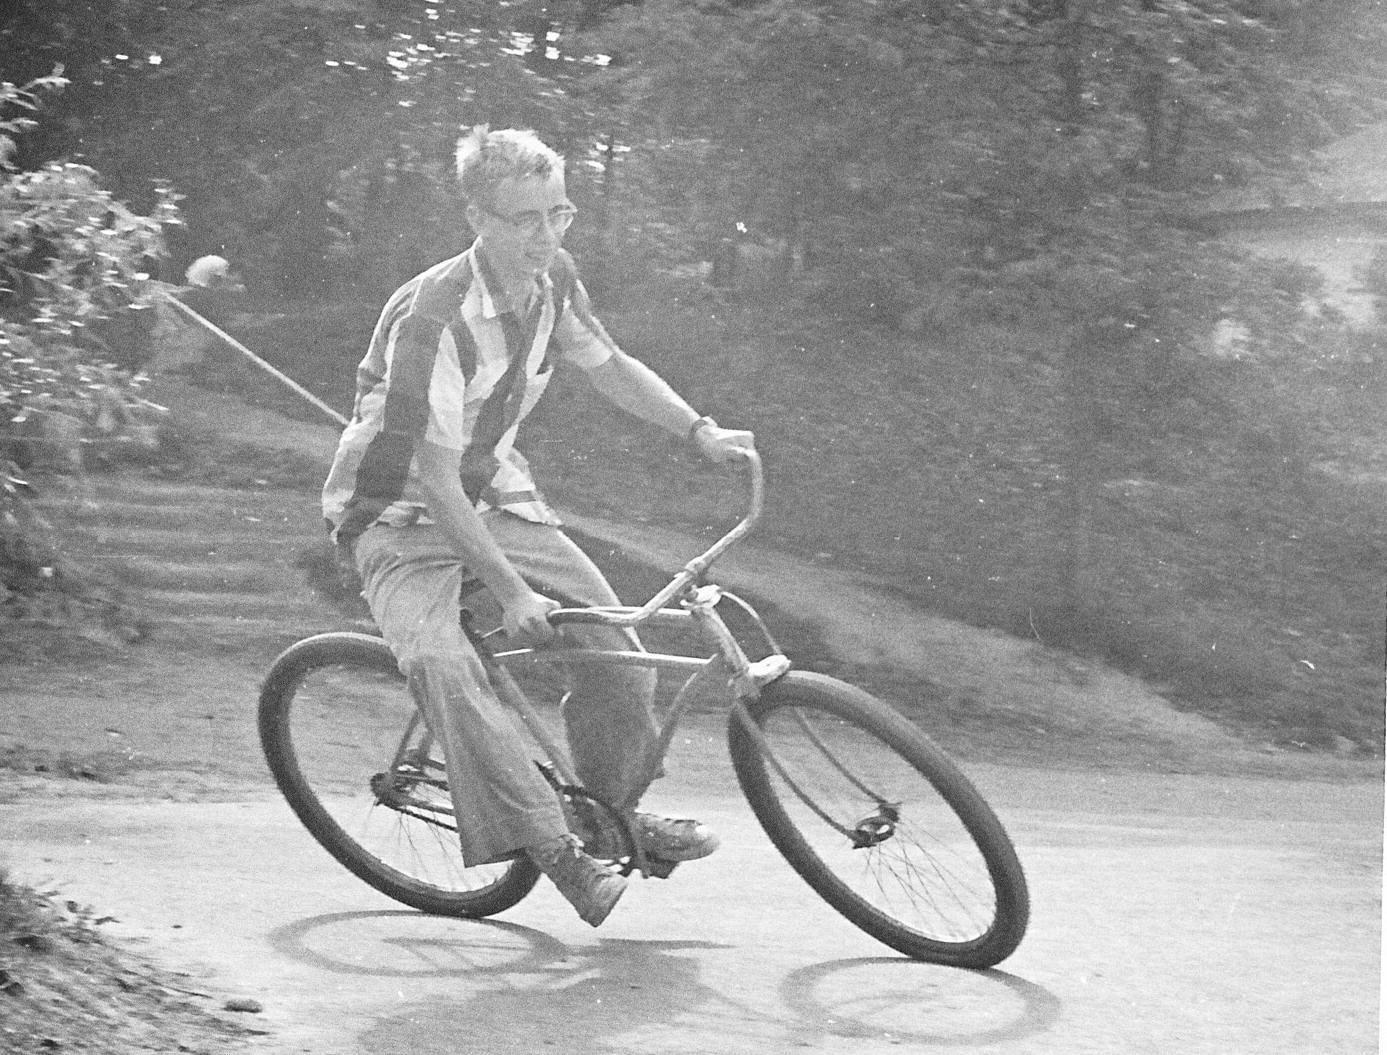 Jonathan on bike